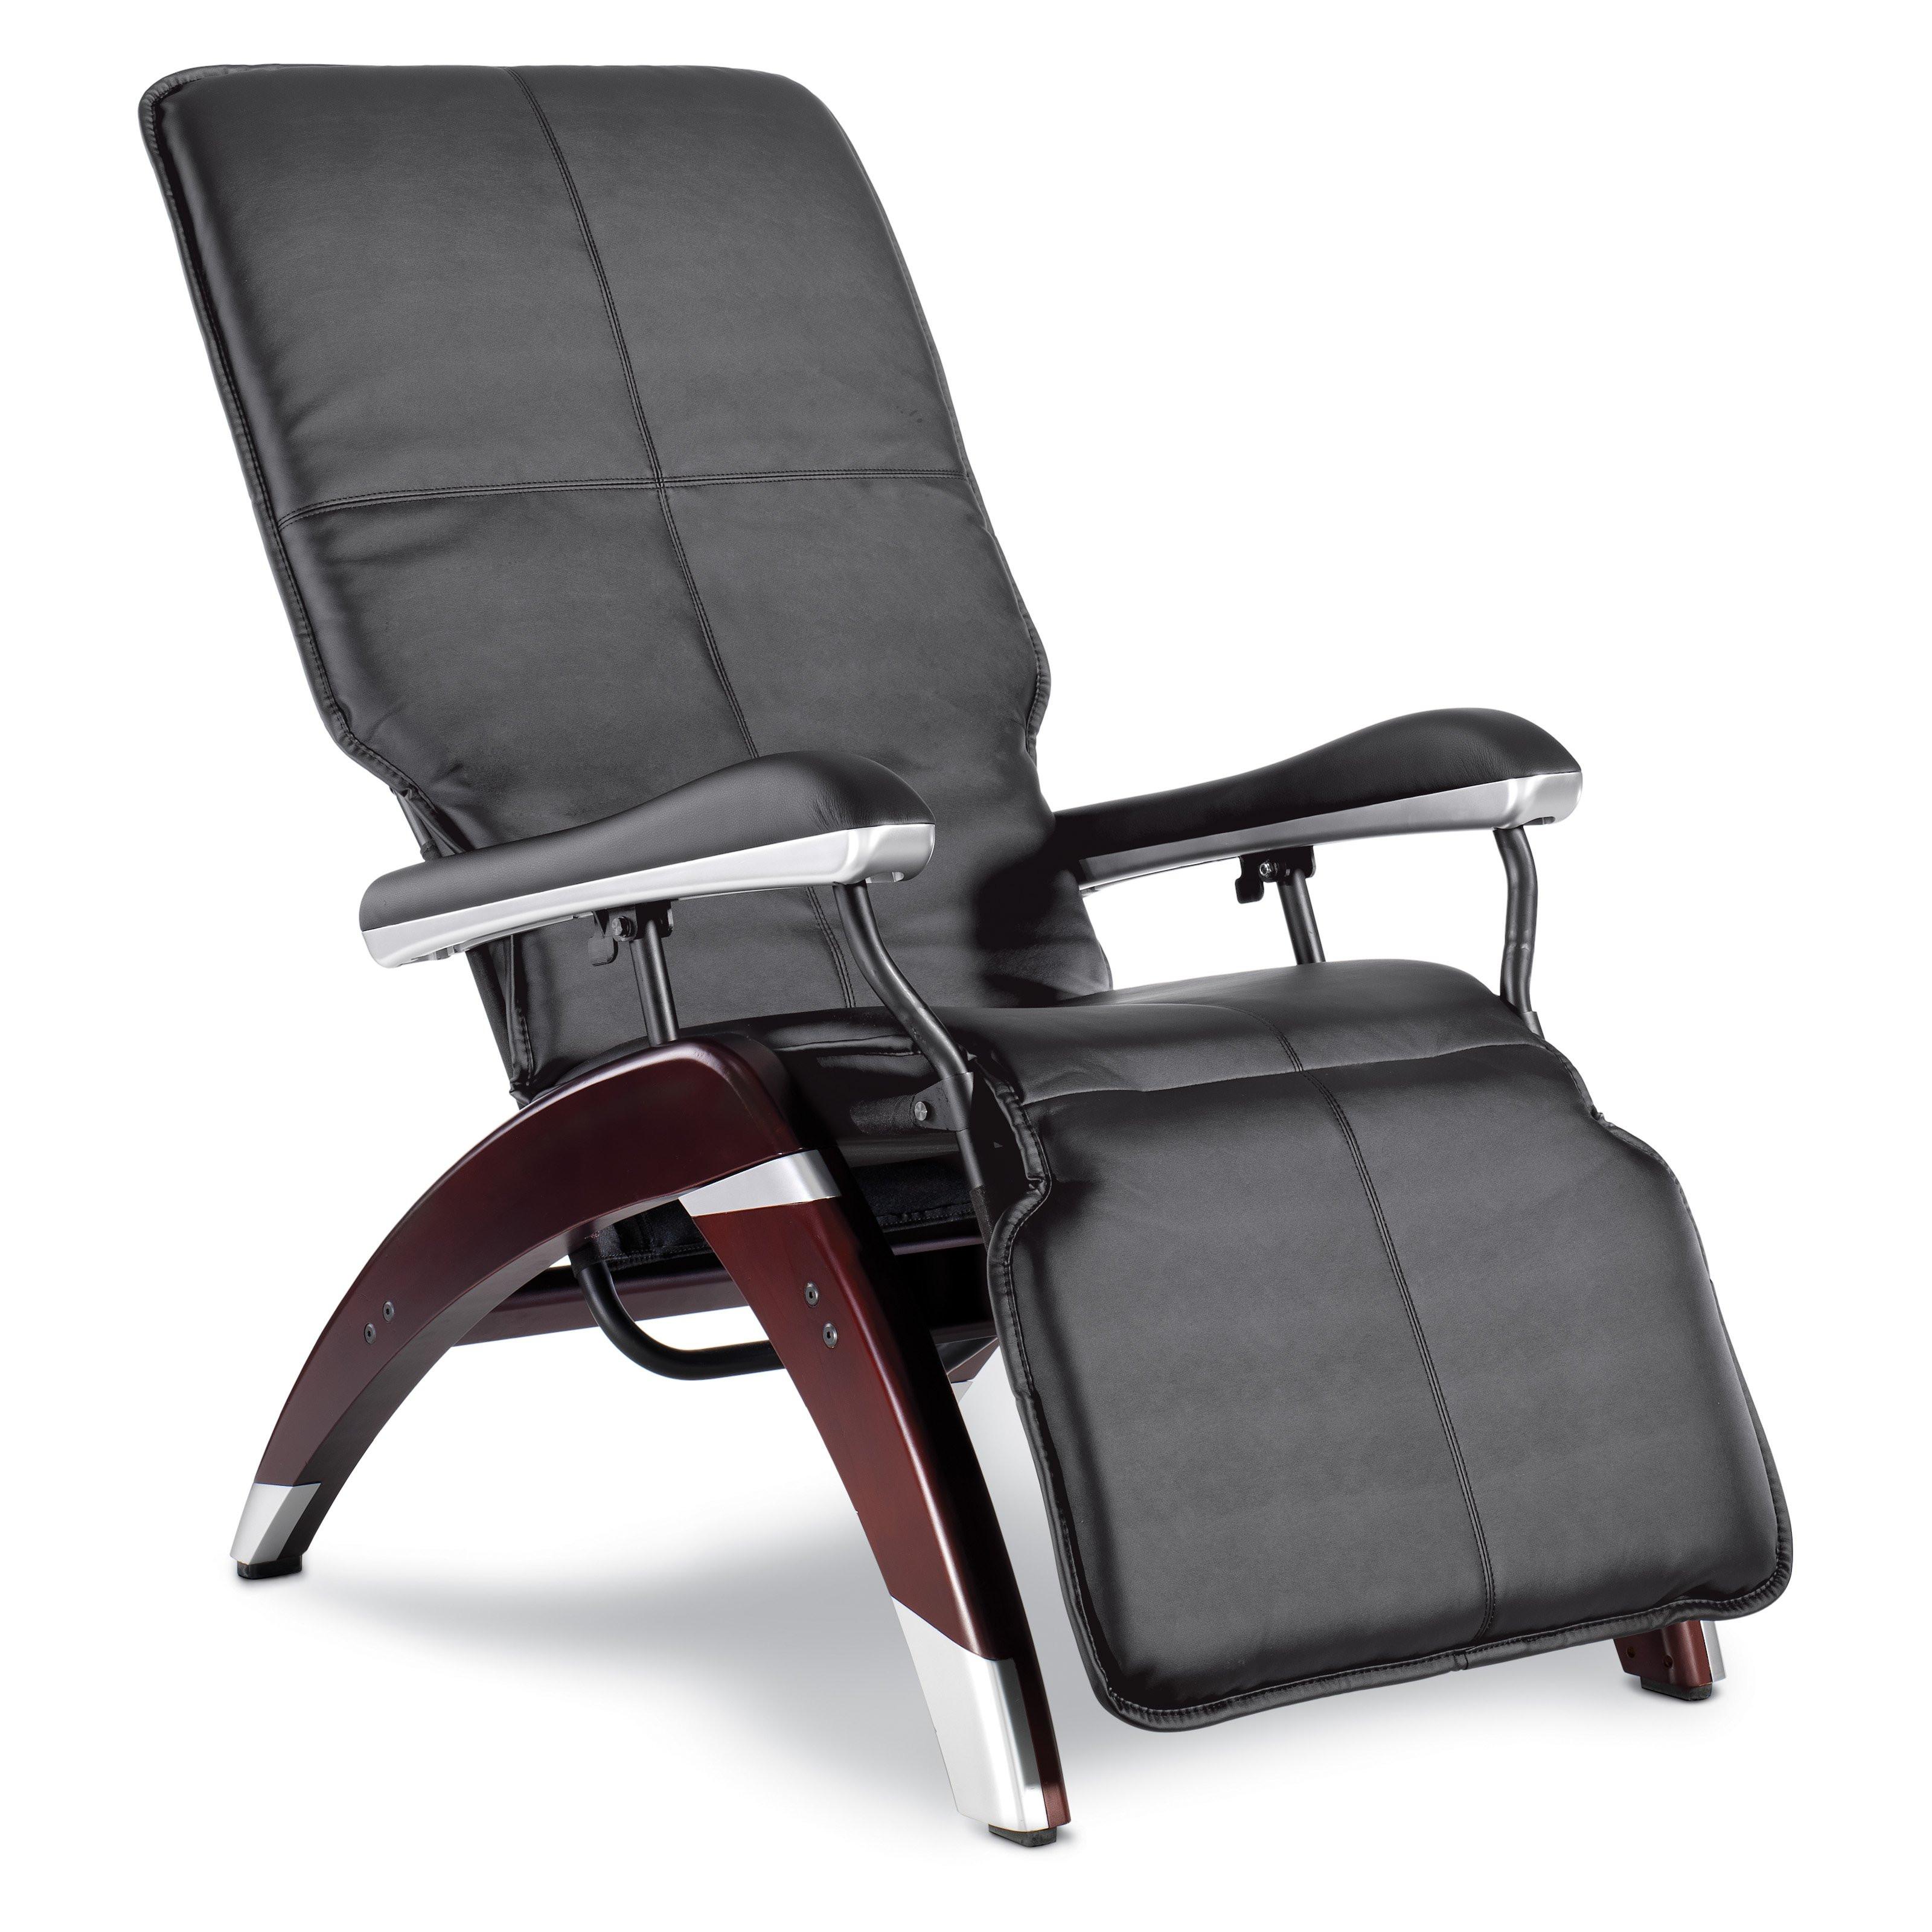 Best ideas about Indoor Zero Gravity Chair . Save or Pin Inner Balance Black Zero Gravity Chair ZG530 Indoor Now.